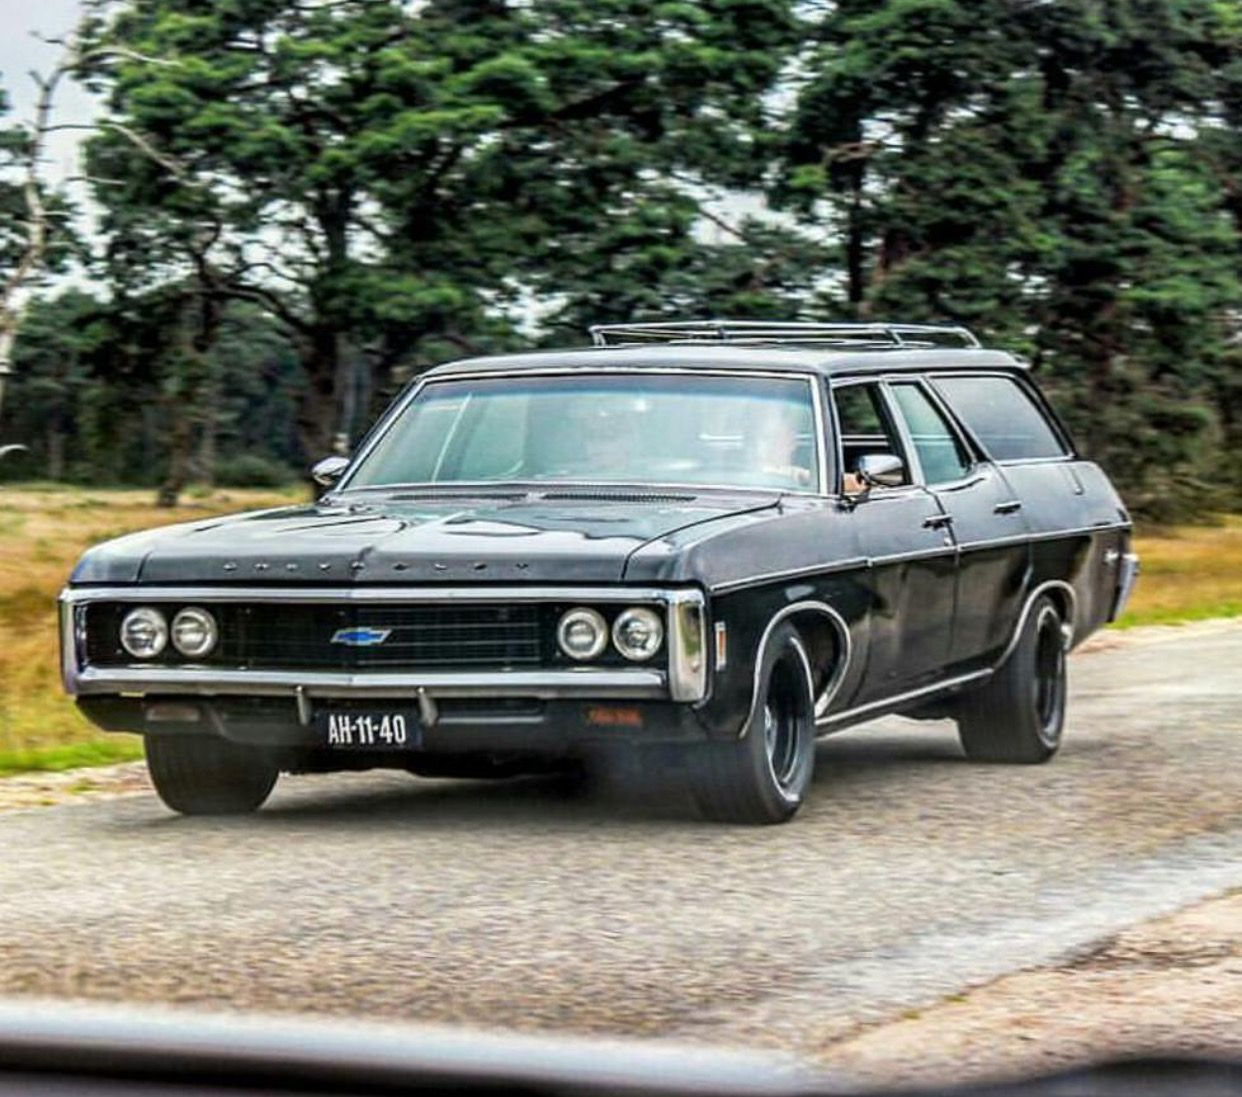 1969 Chevy Impala Kingswood Chevrolet Impala Station Wagon